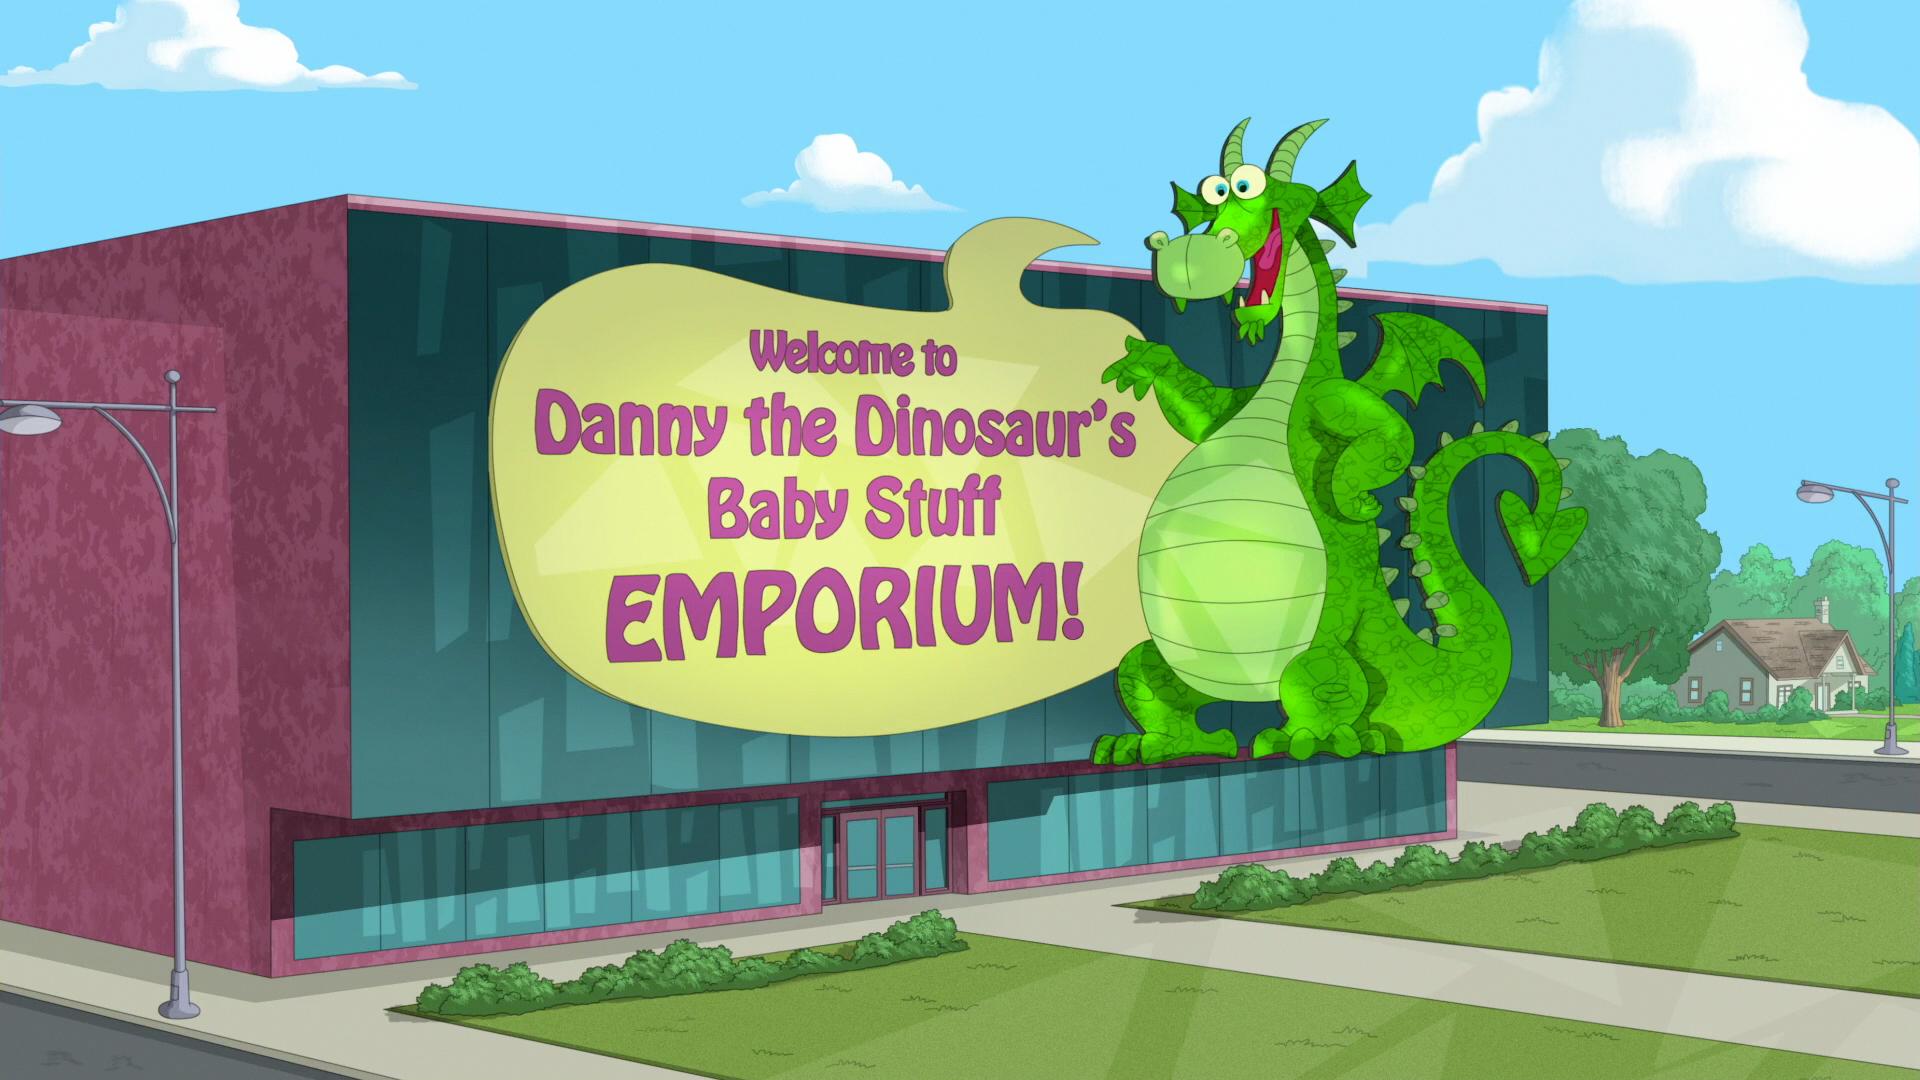 Danny the Dinosaur's Baby Stuff Emporium!